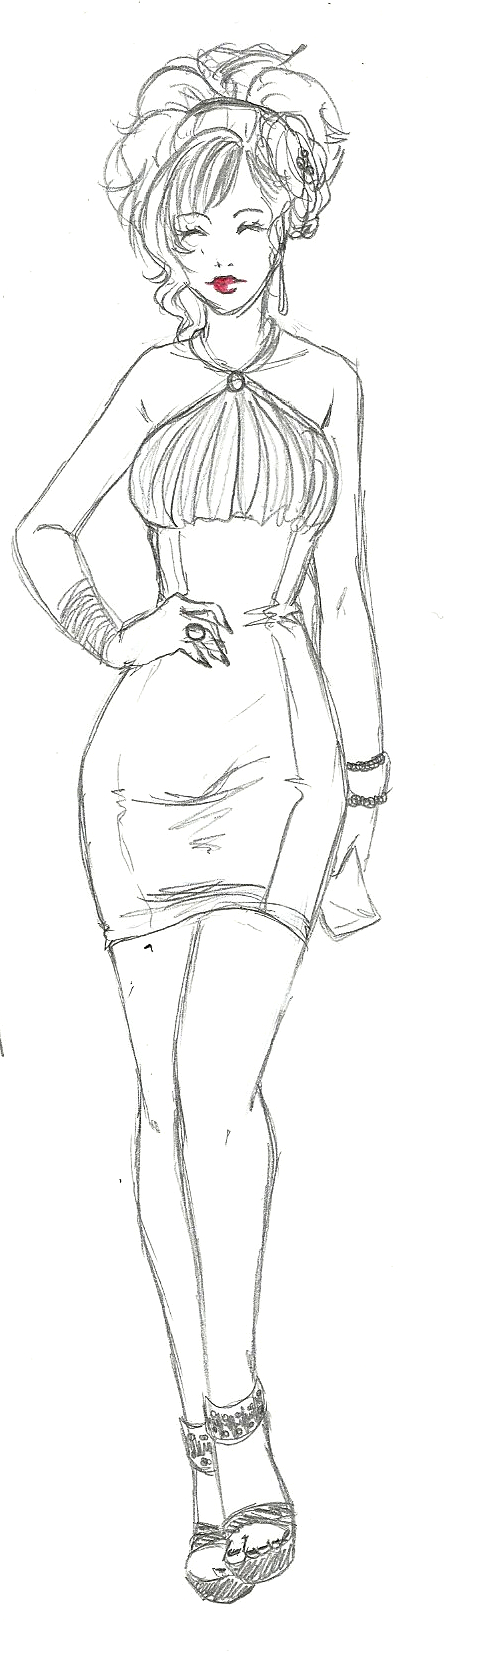 Naty Sketch2 by Paulinda-art